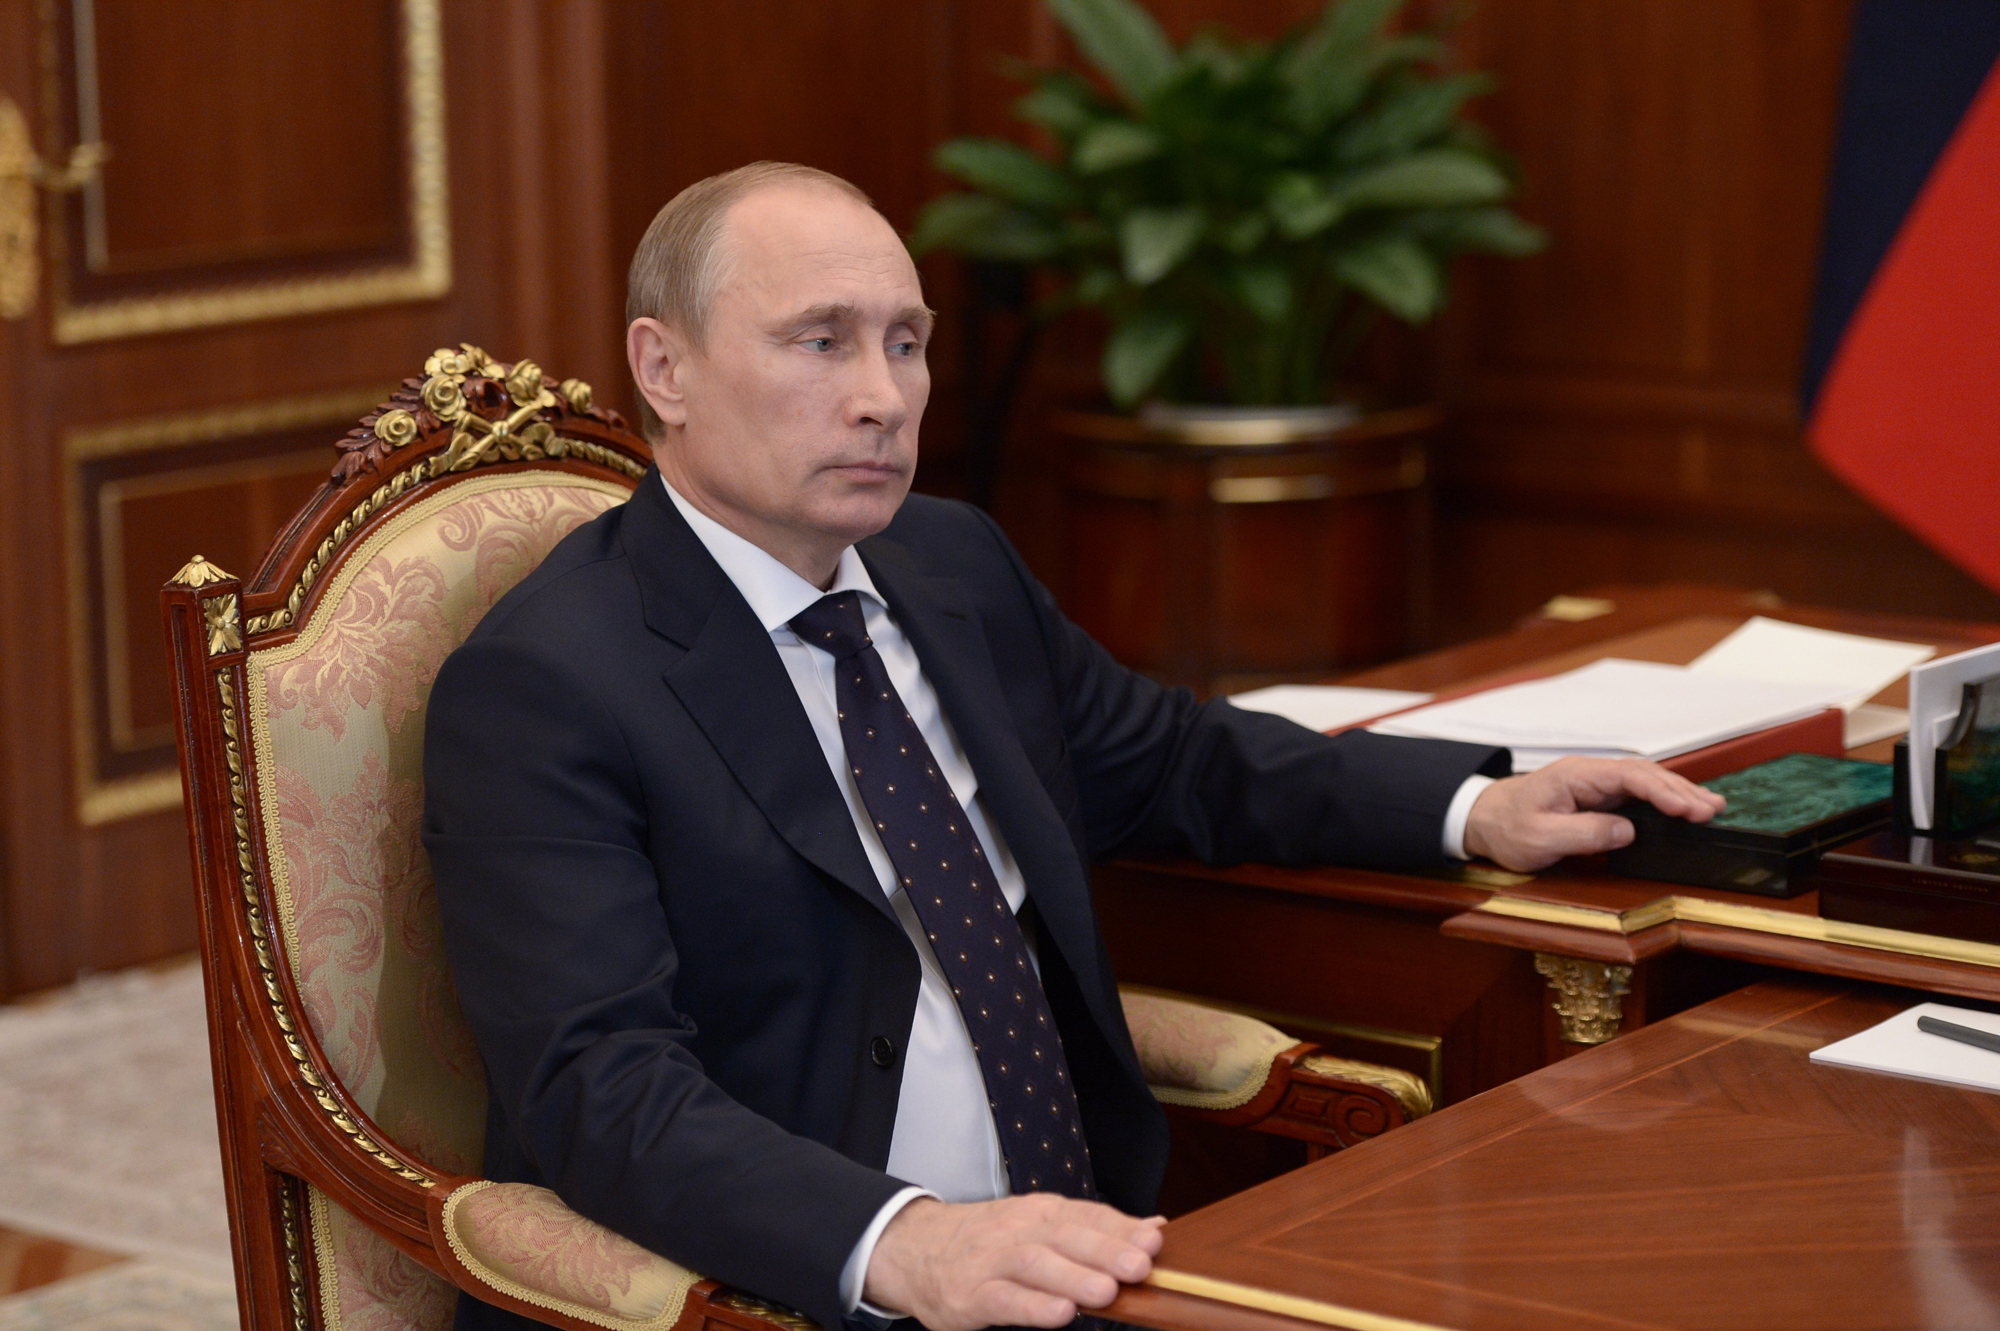 President Vladimir Putin in Kremlin, July 4.